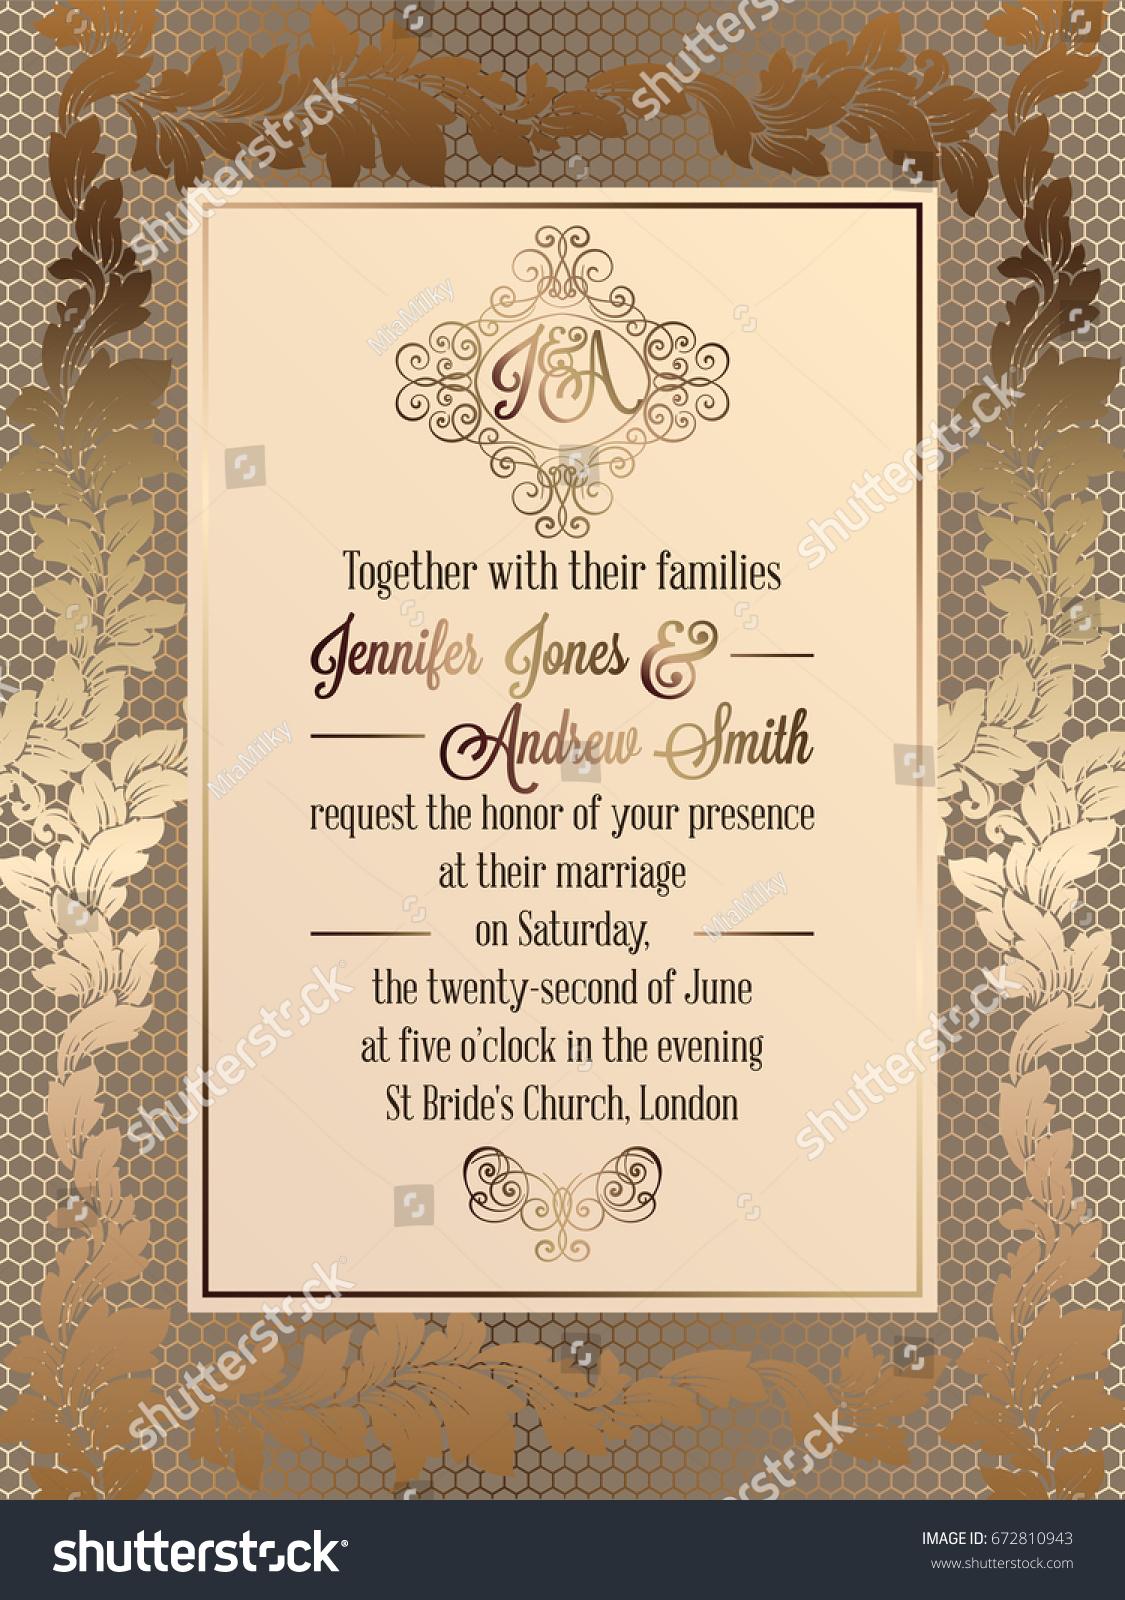 formal invitation card stock images invitation sample and invitation design. Black Bedroom Furniture Sets. Home Design Ideas